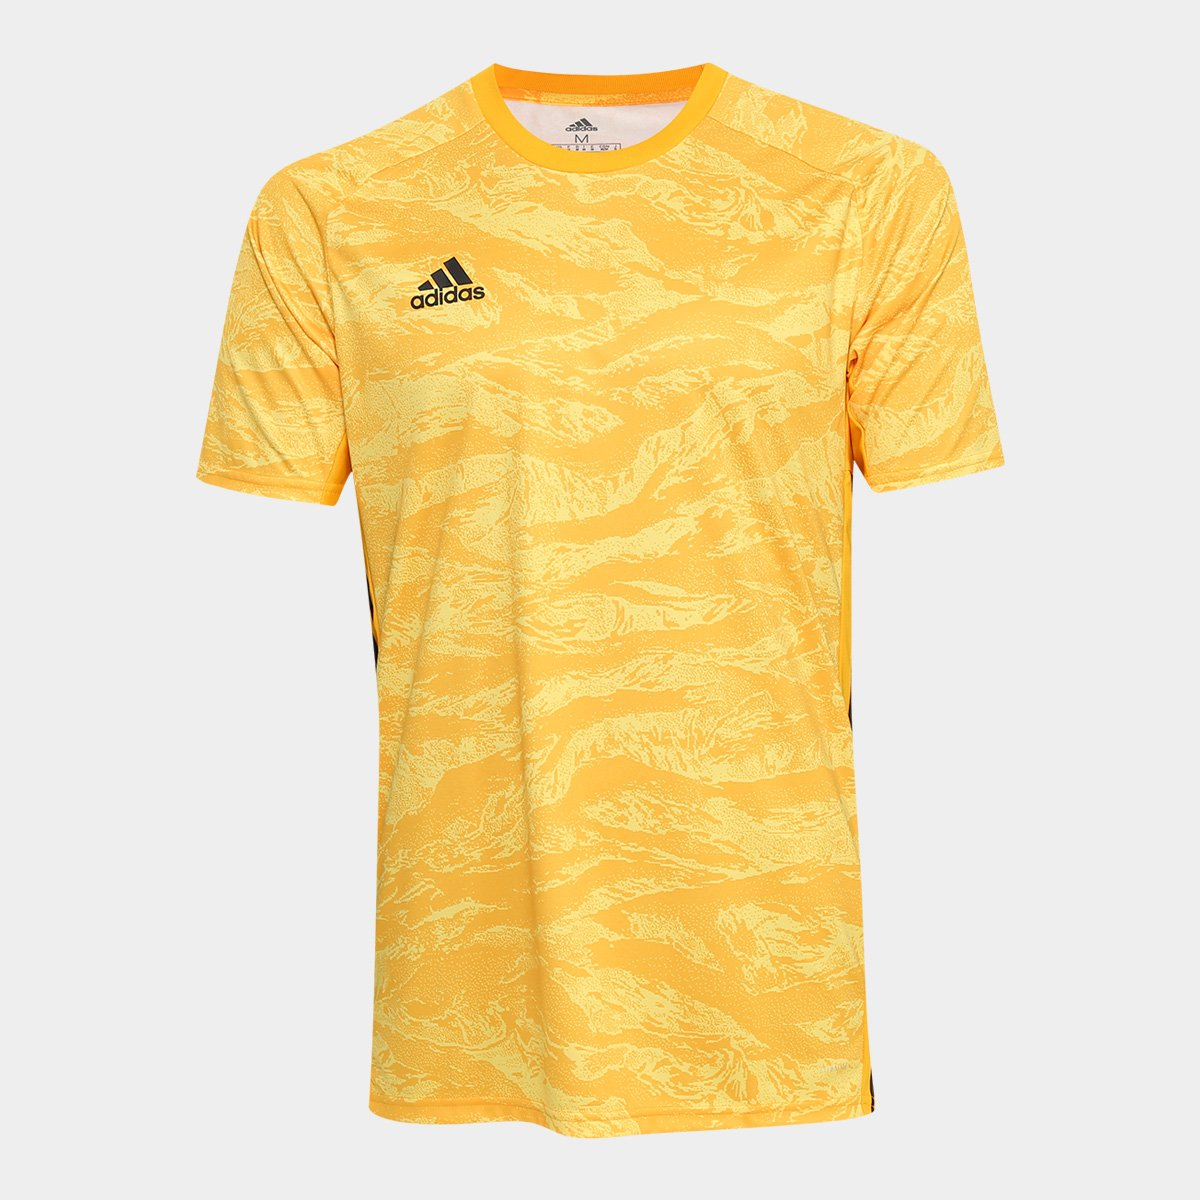 30abba6c49cdb Camisa Adidas Goleiro Adipro 19 Masculina